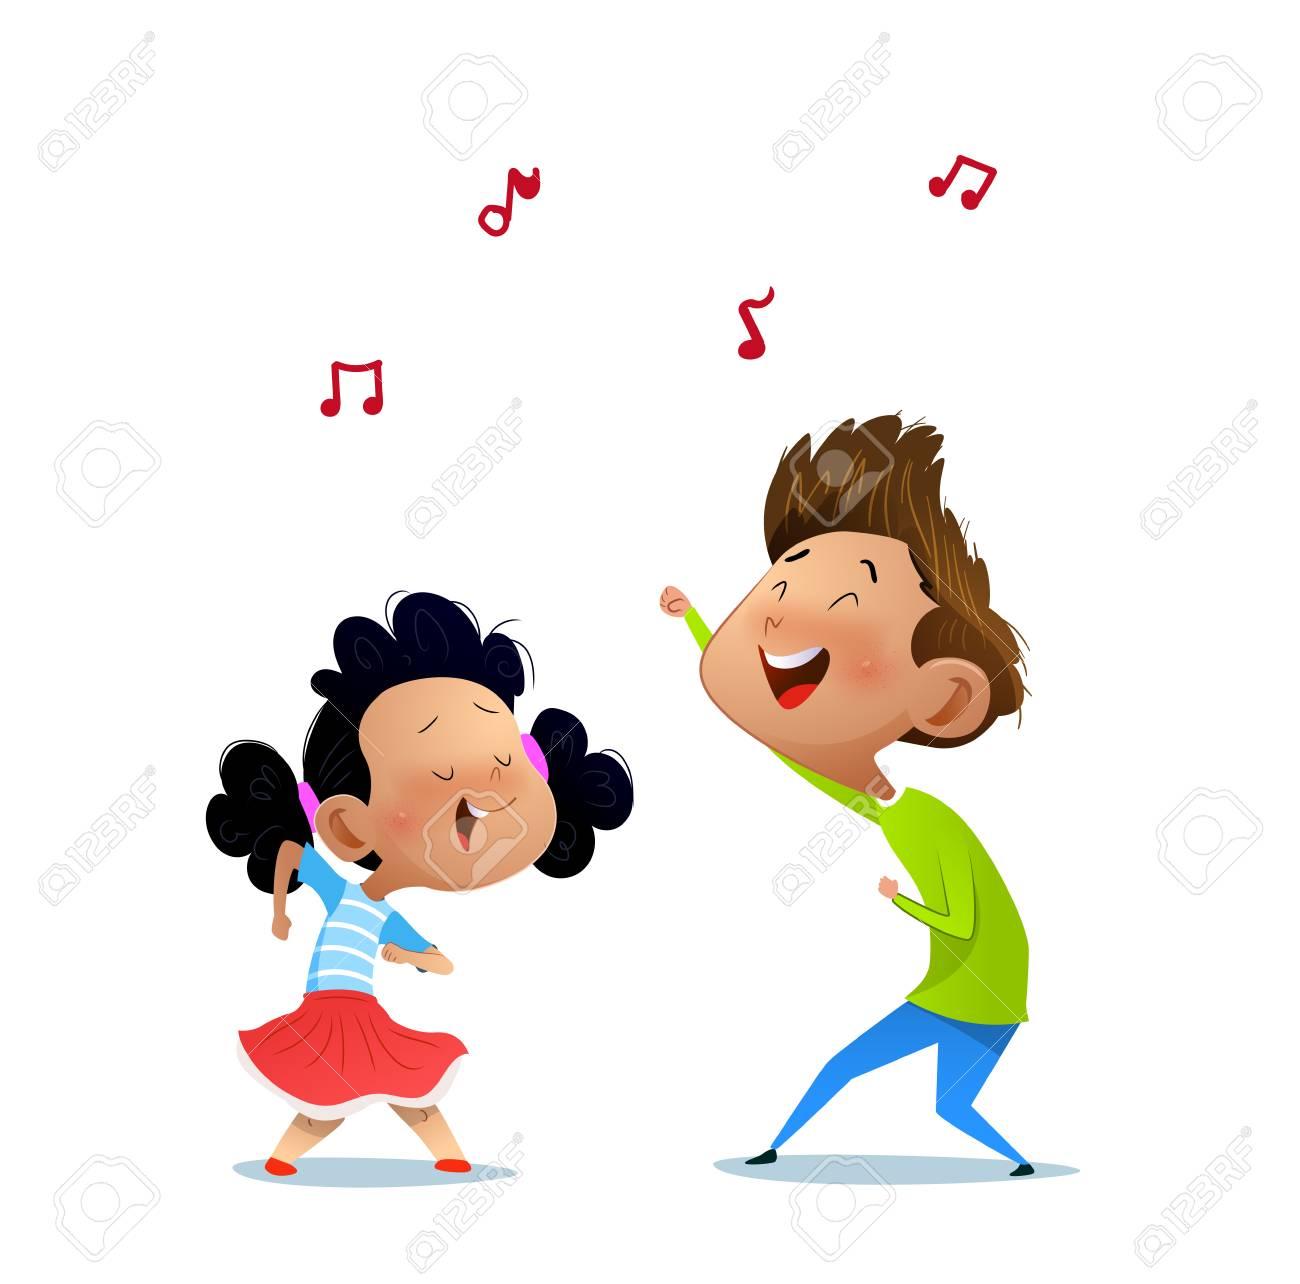 Illustration of two dancing kids. Cartoon vector illustration - 115243747